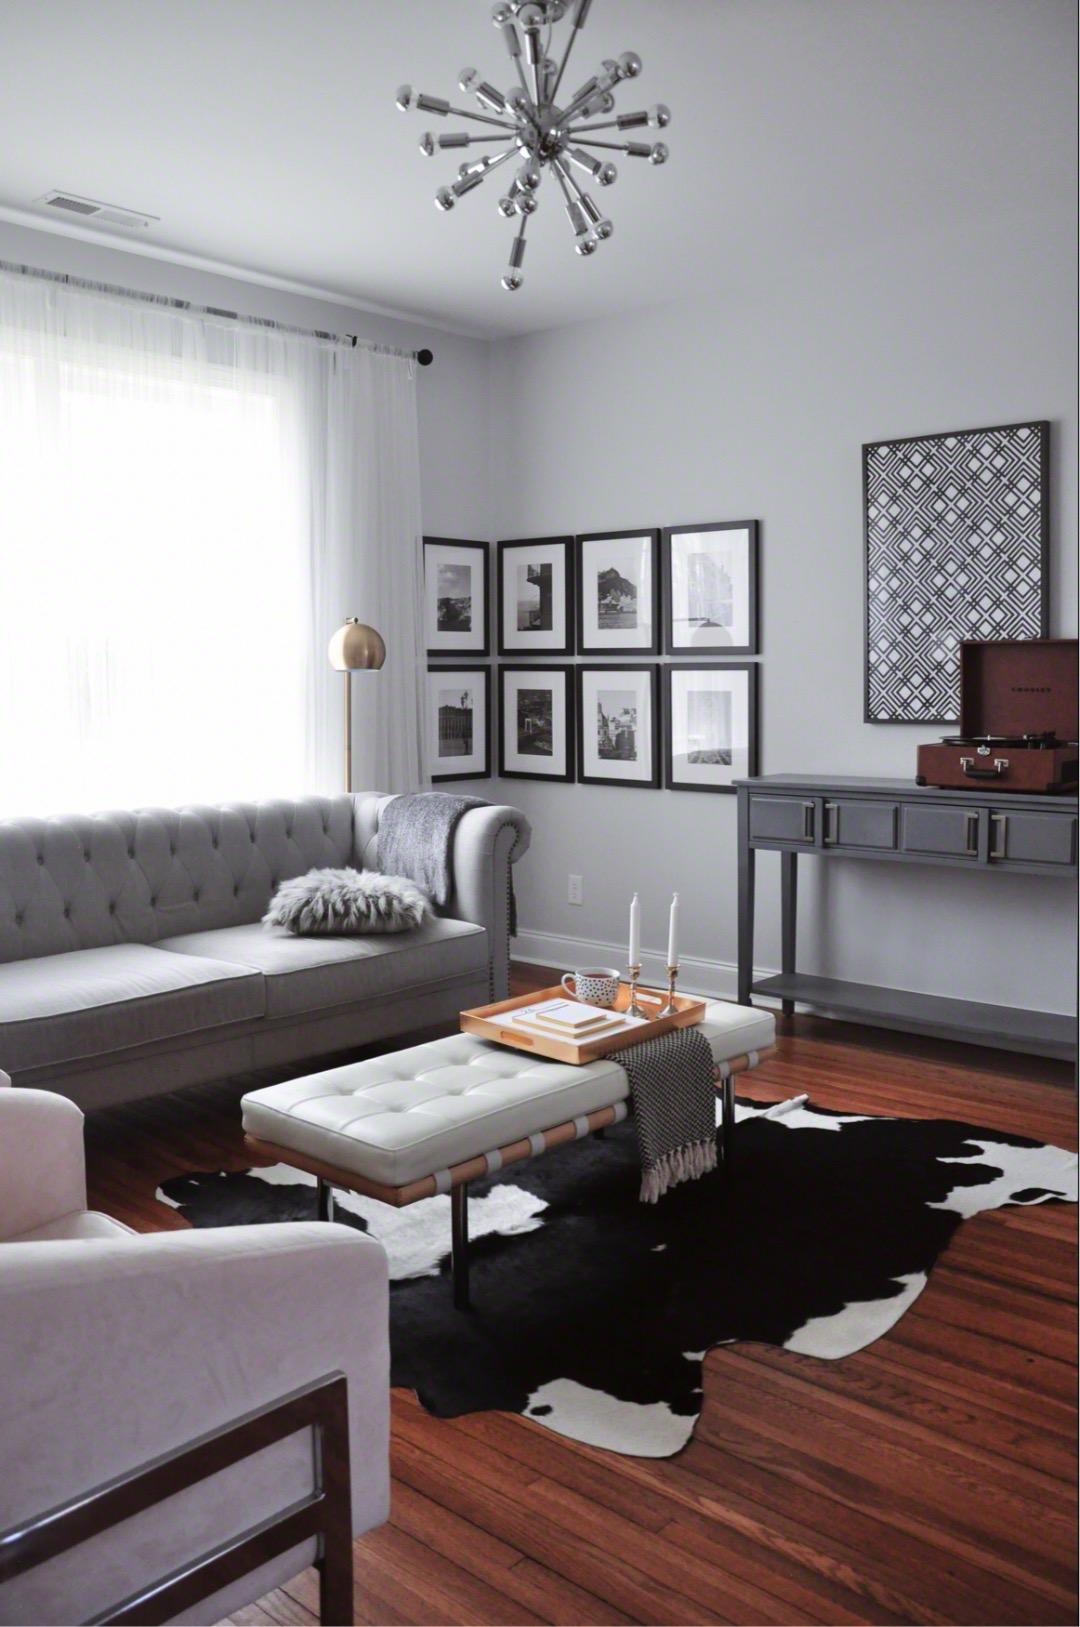 FOXY OXIE - Living Room 2.jpg